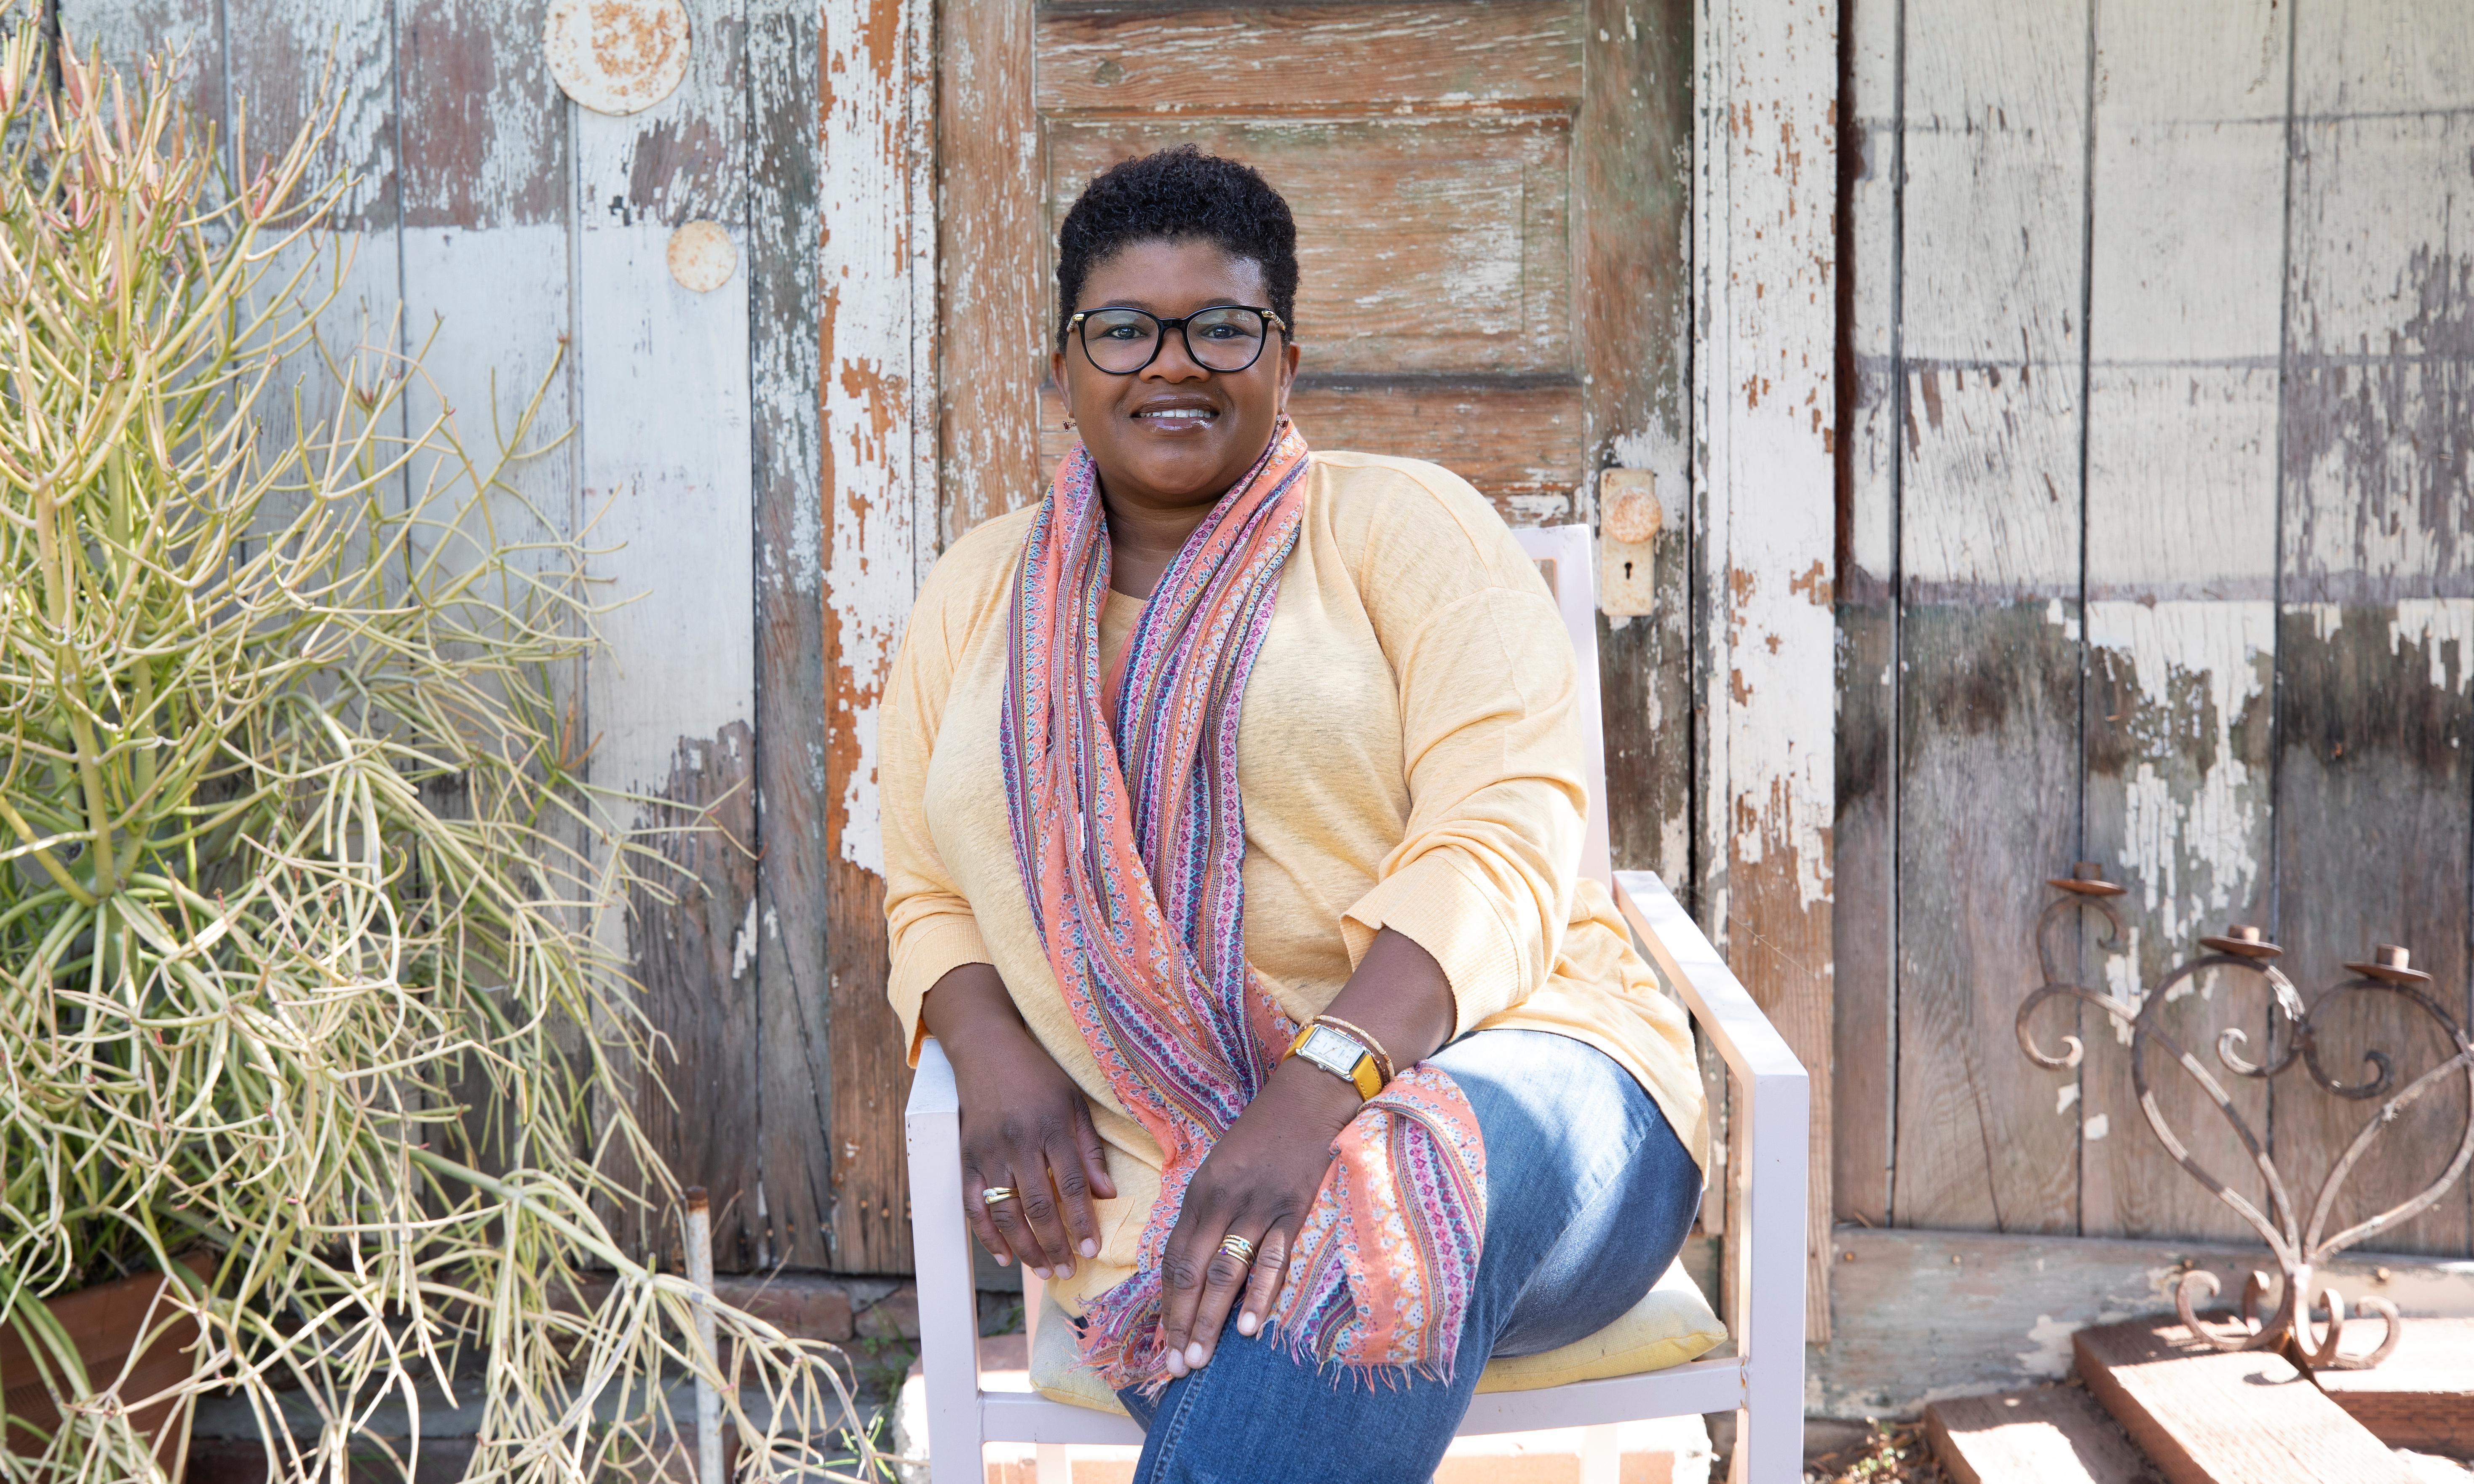 Attica Locke: 'When I feel racial pain, I play blues songs'